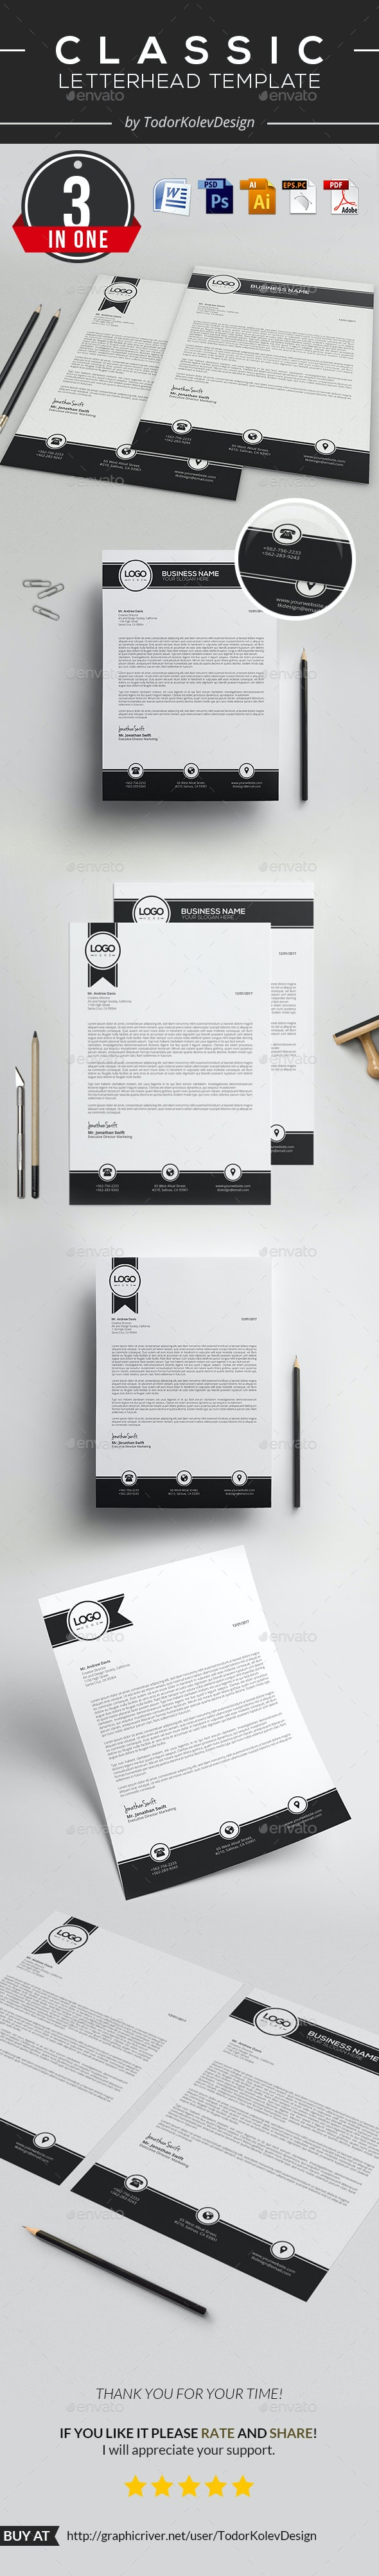 Classic Letterhead - Stationery Print Templates